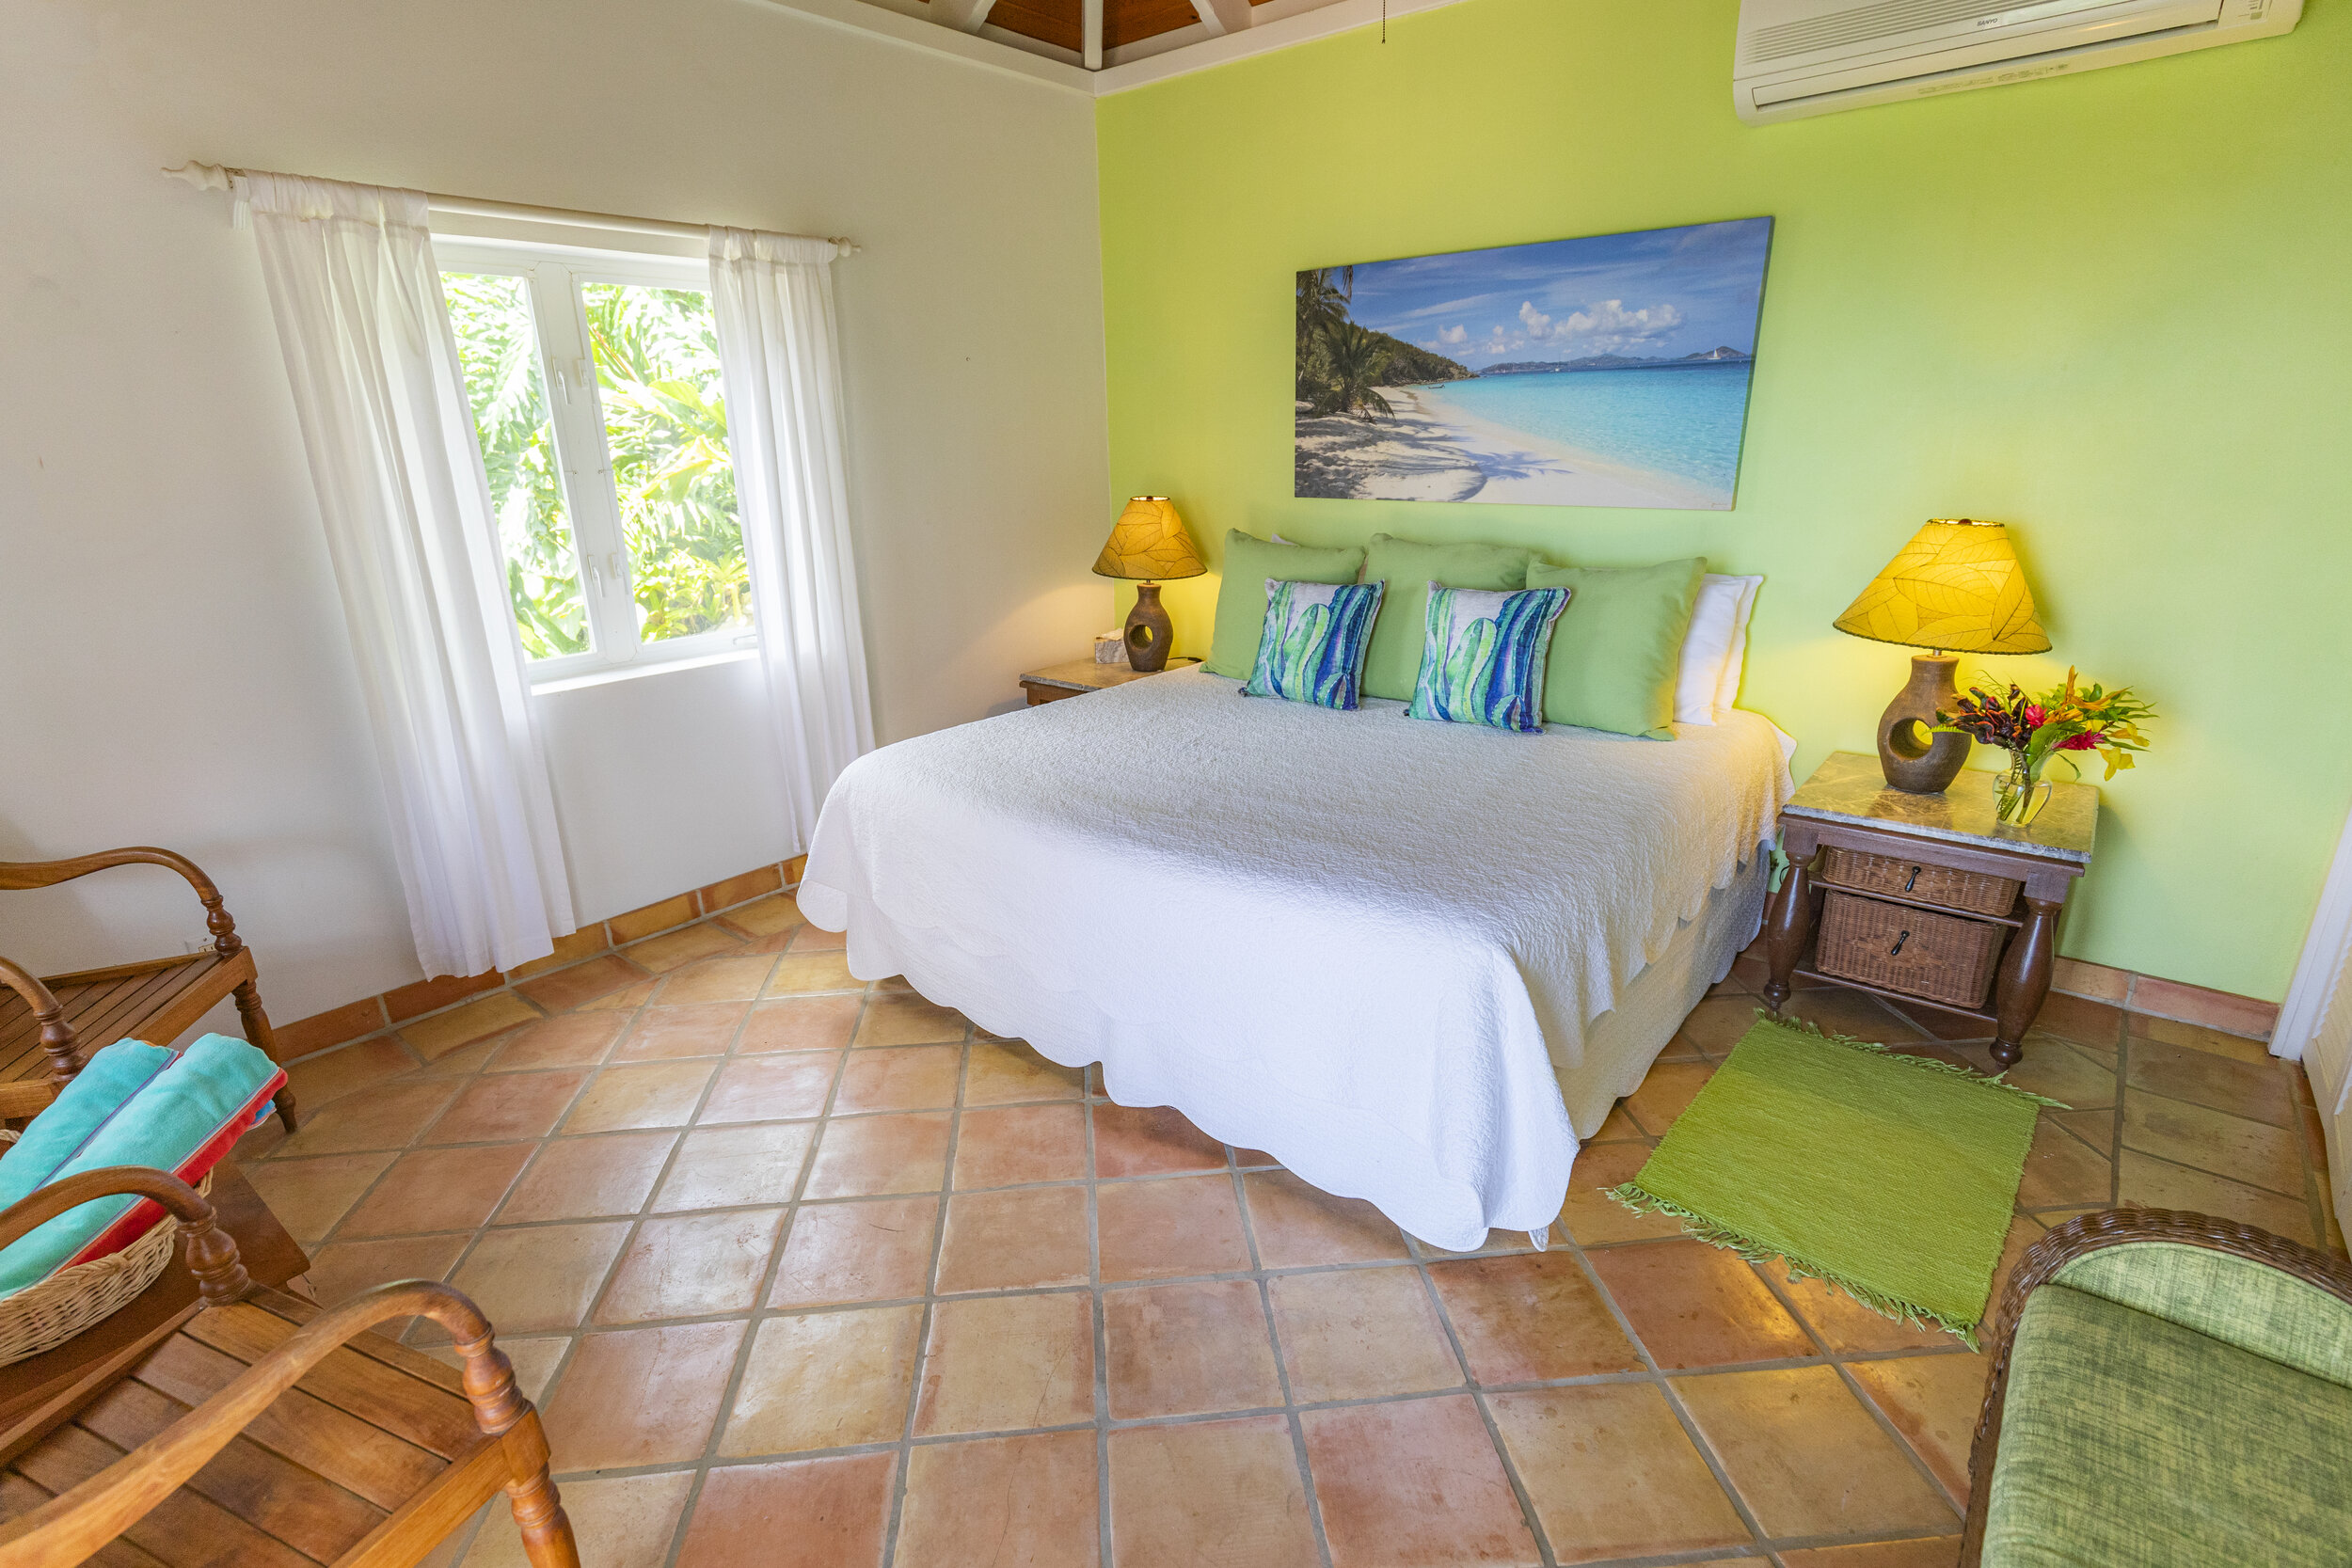 cottagebedroomcanon2.jpg